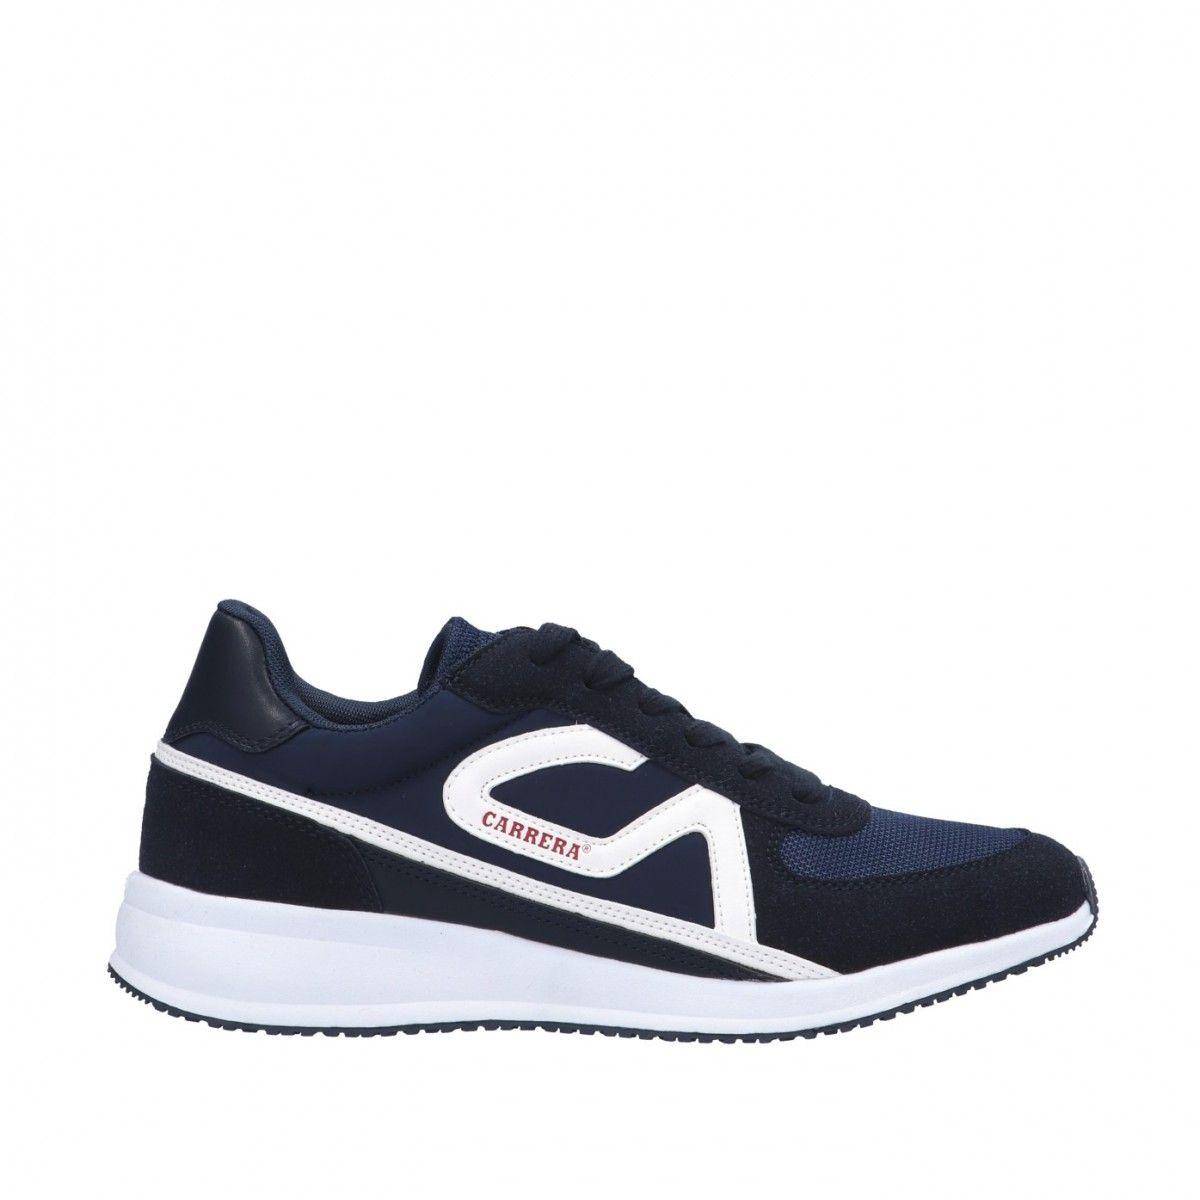 Carrera Sneaker Blu Gomma...